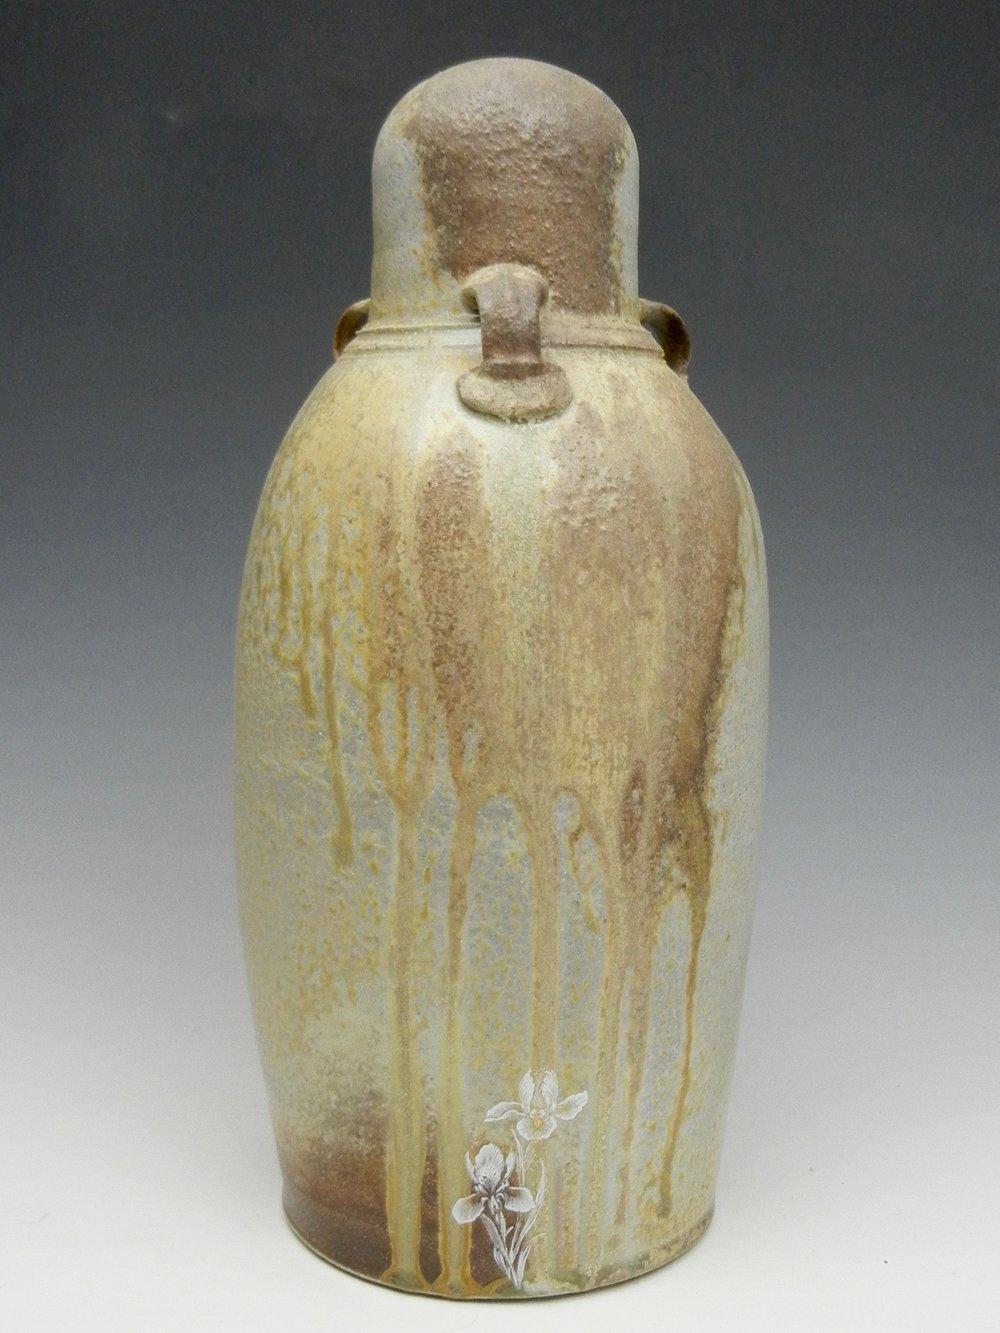 Lorenz Pottery, handmade, ceramics, pottery, folk pottery, wood fired, soda fired, grave marker